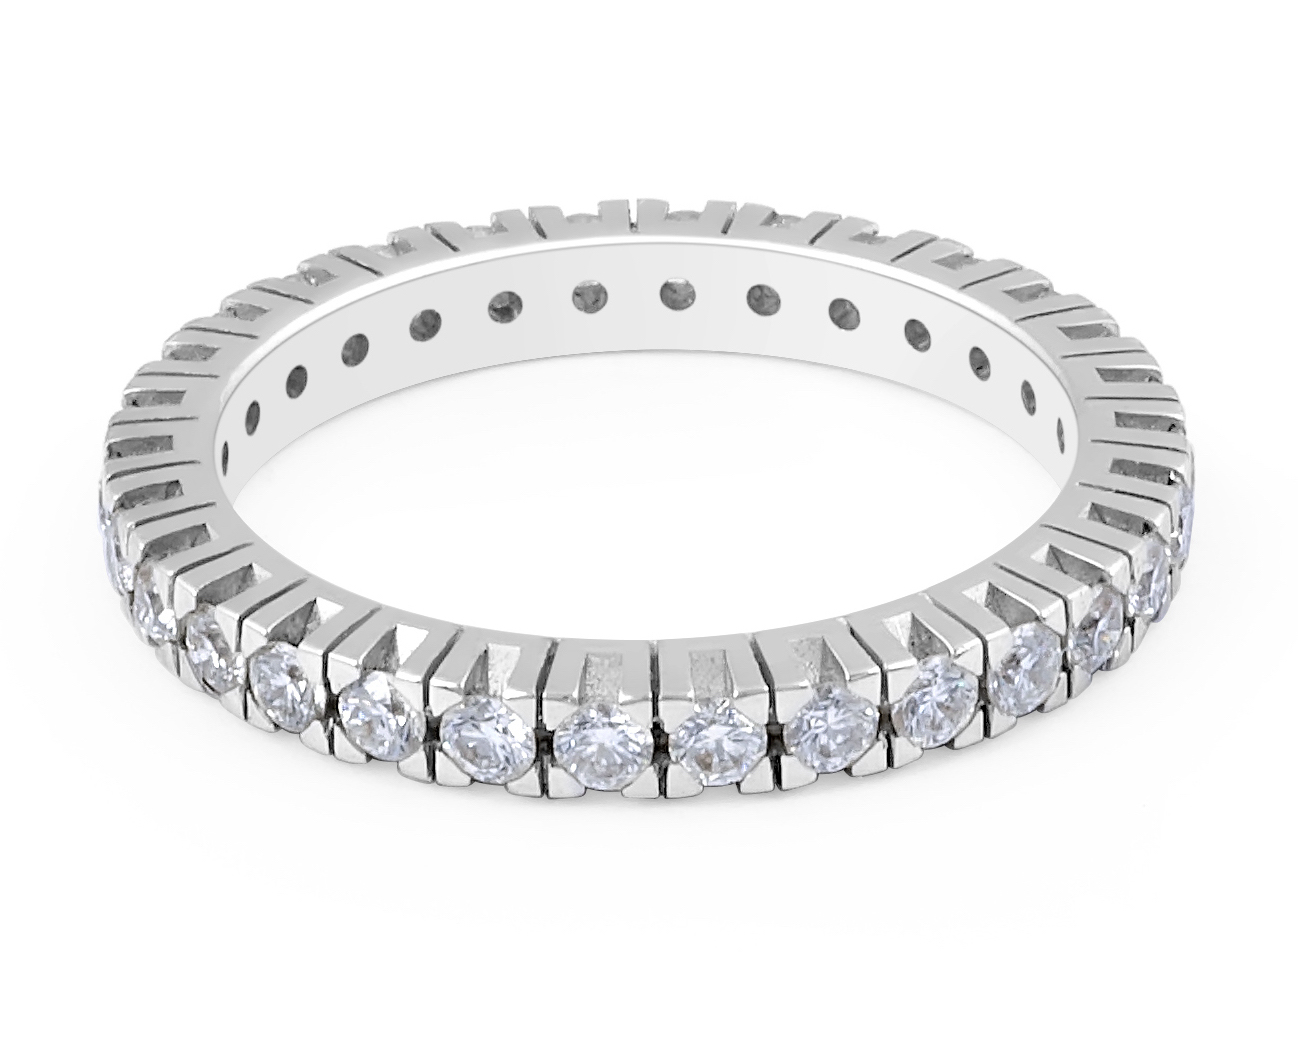 18 Karat White Gold Modern Eternity Design Diamond Wedding Band - womens wedding band